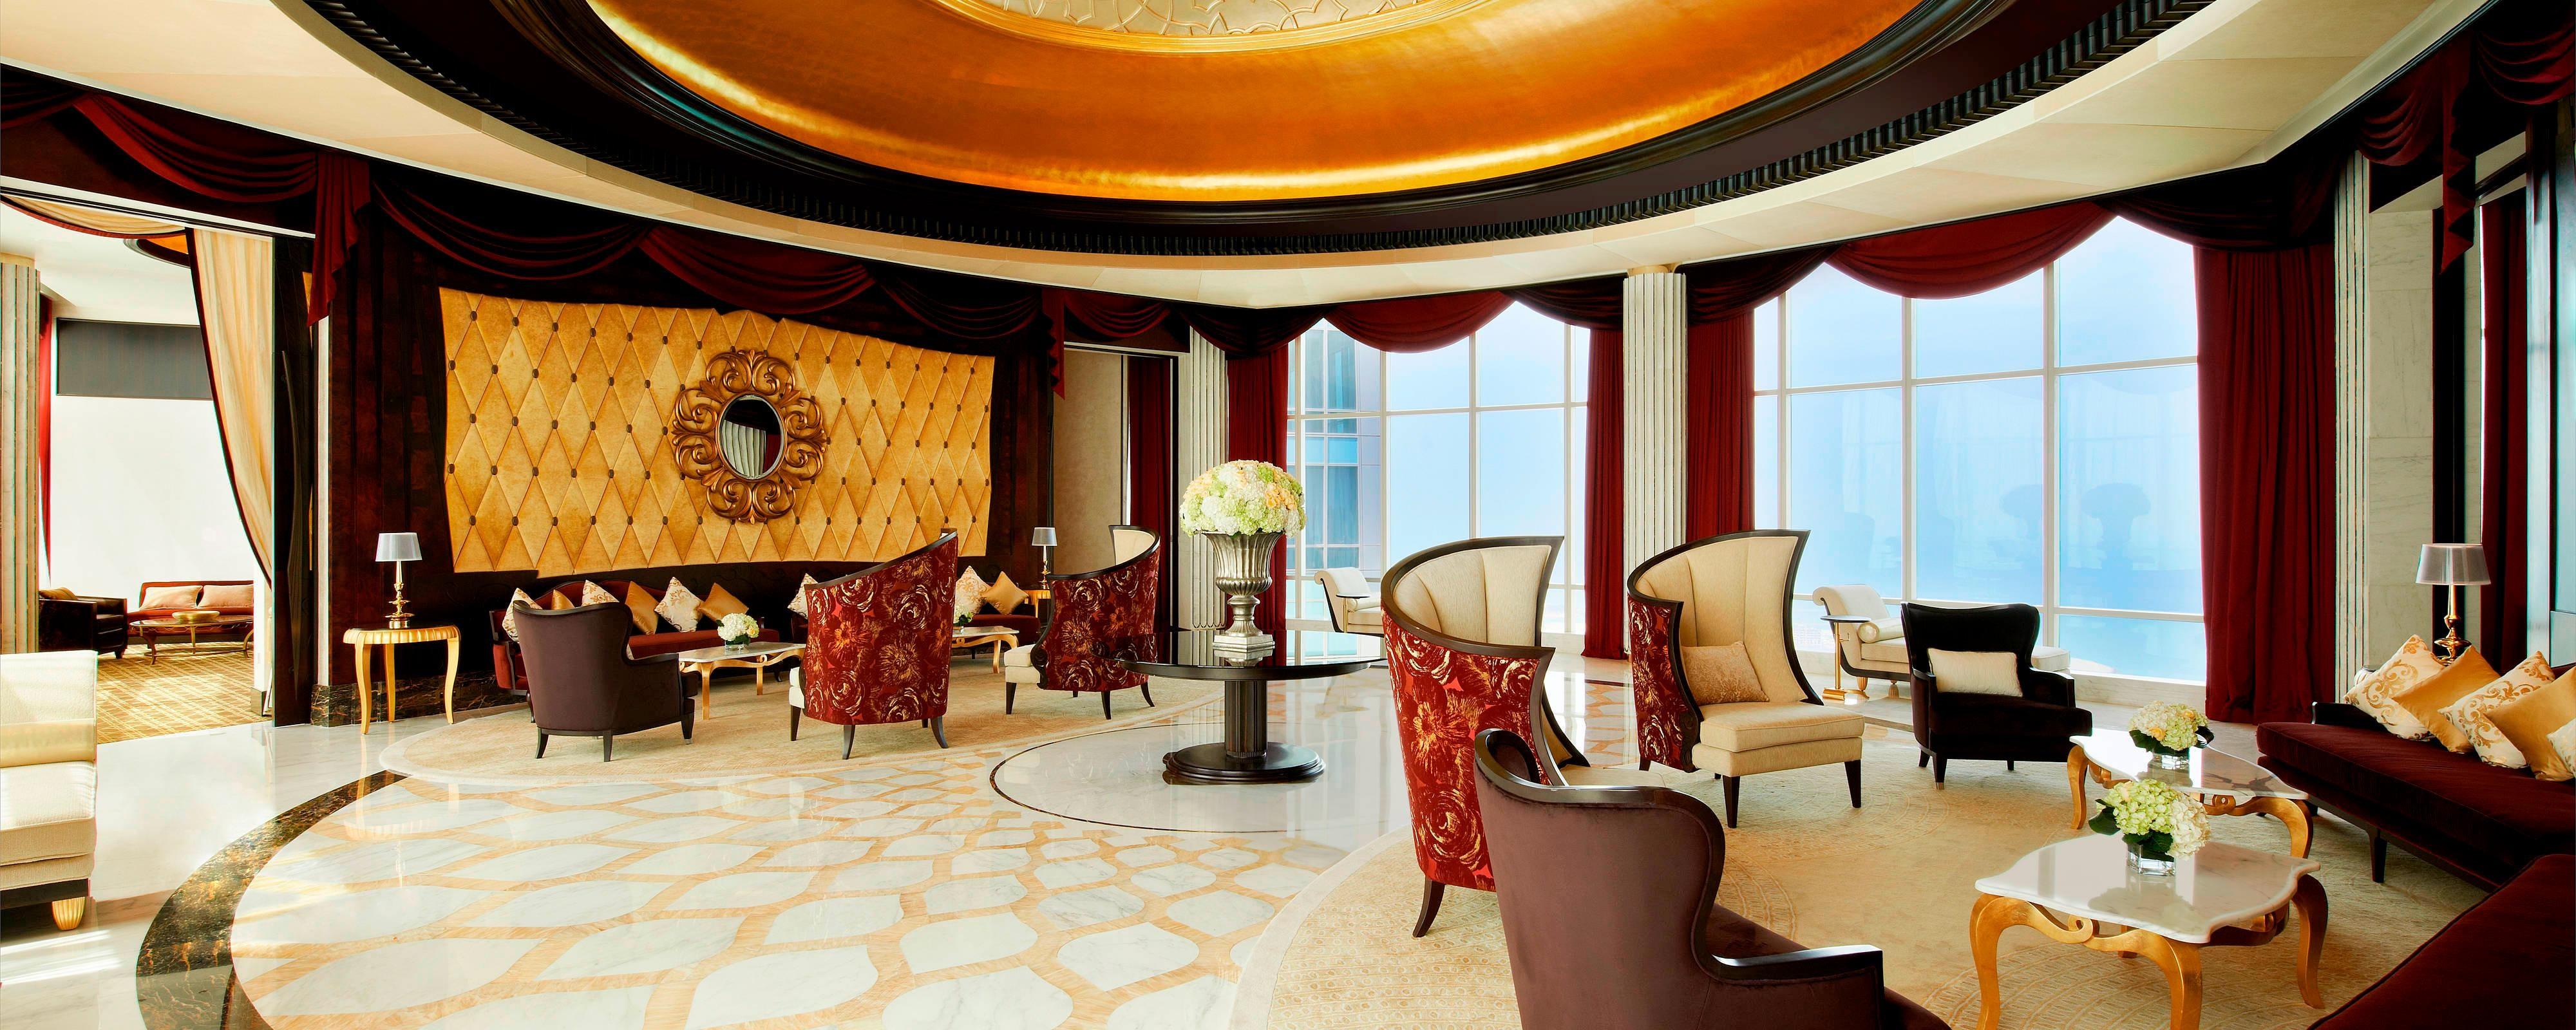 Abu Dhabi Suite - Majlis